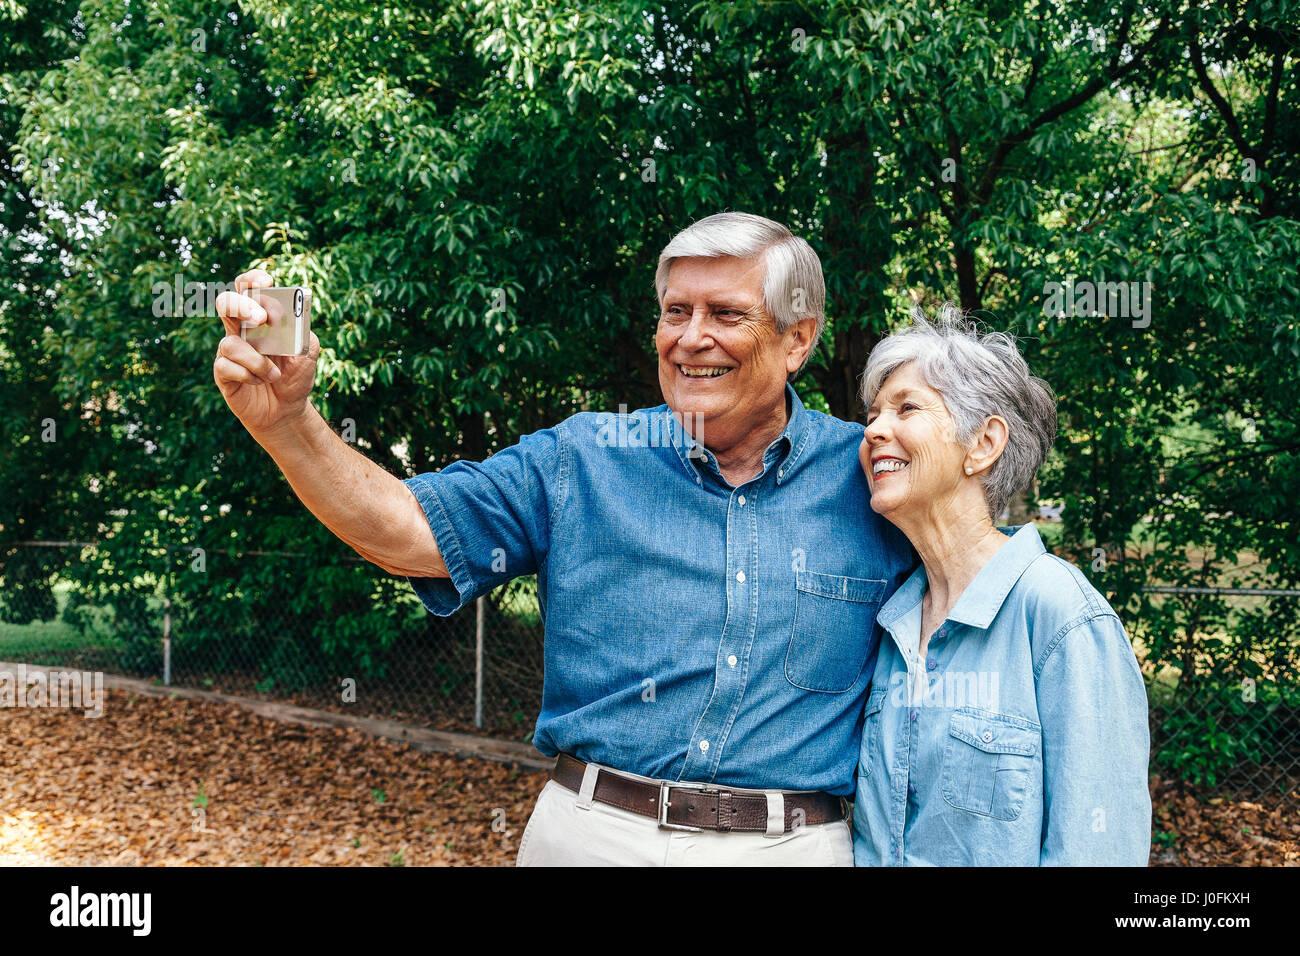 Älteres paar nehmen Selfie im Park Stockbild